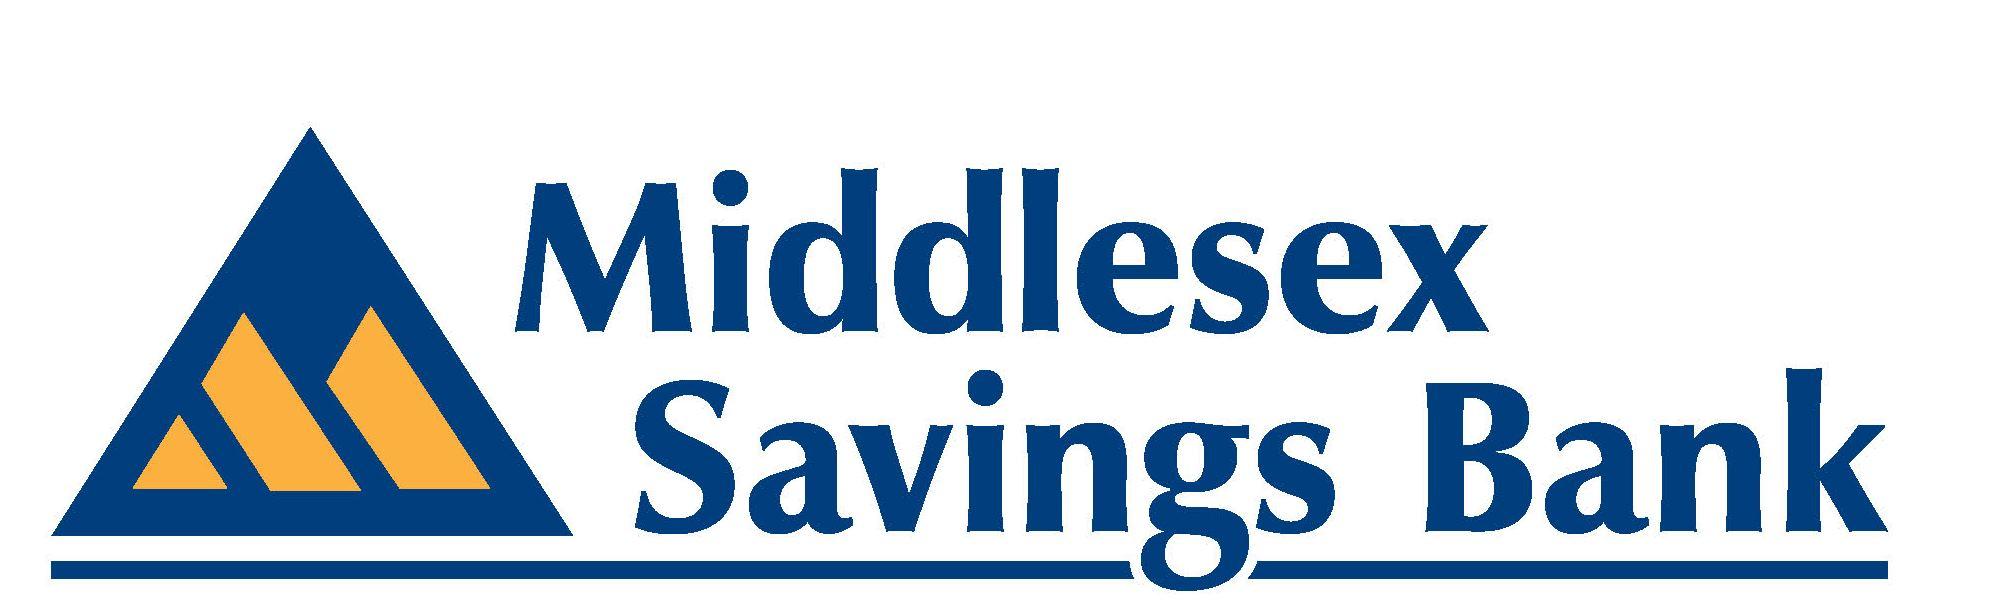 Sponsor_Middlesex Savings Bank